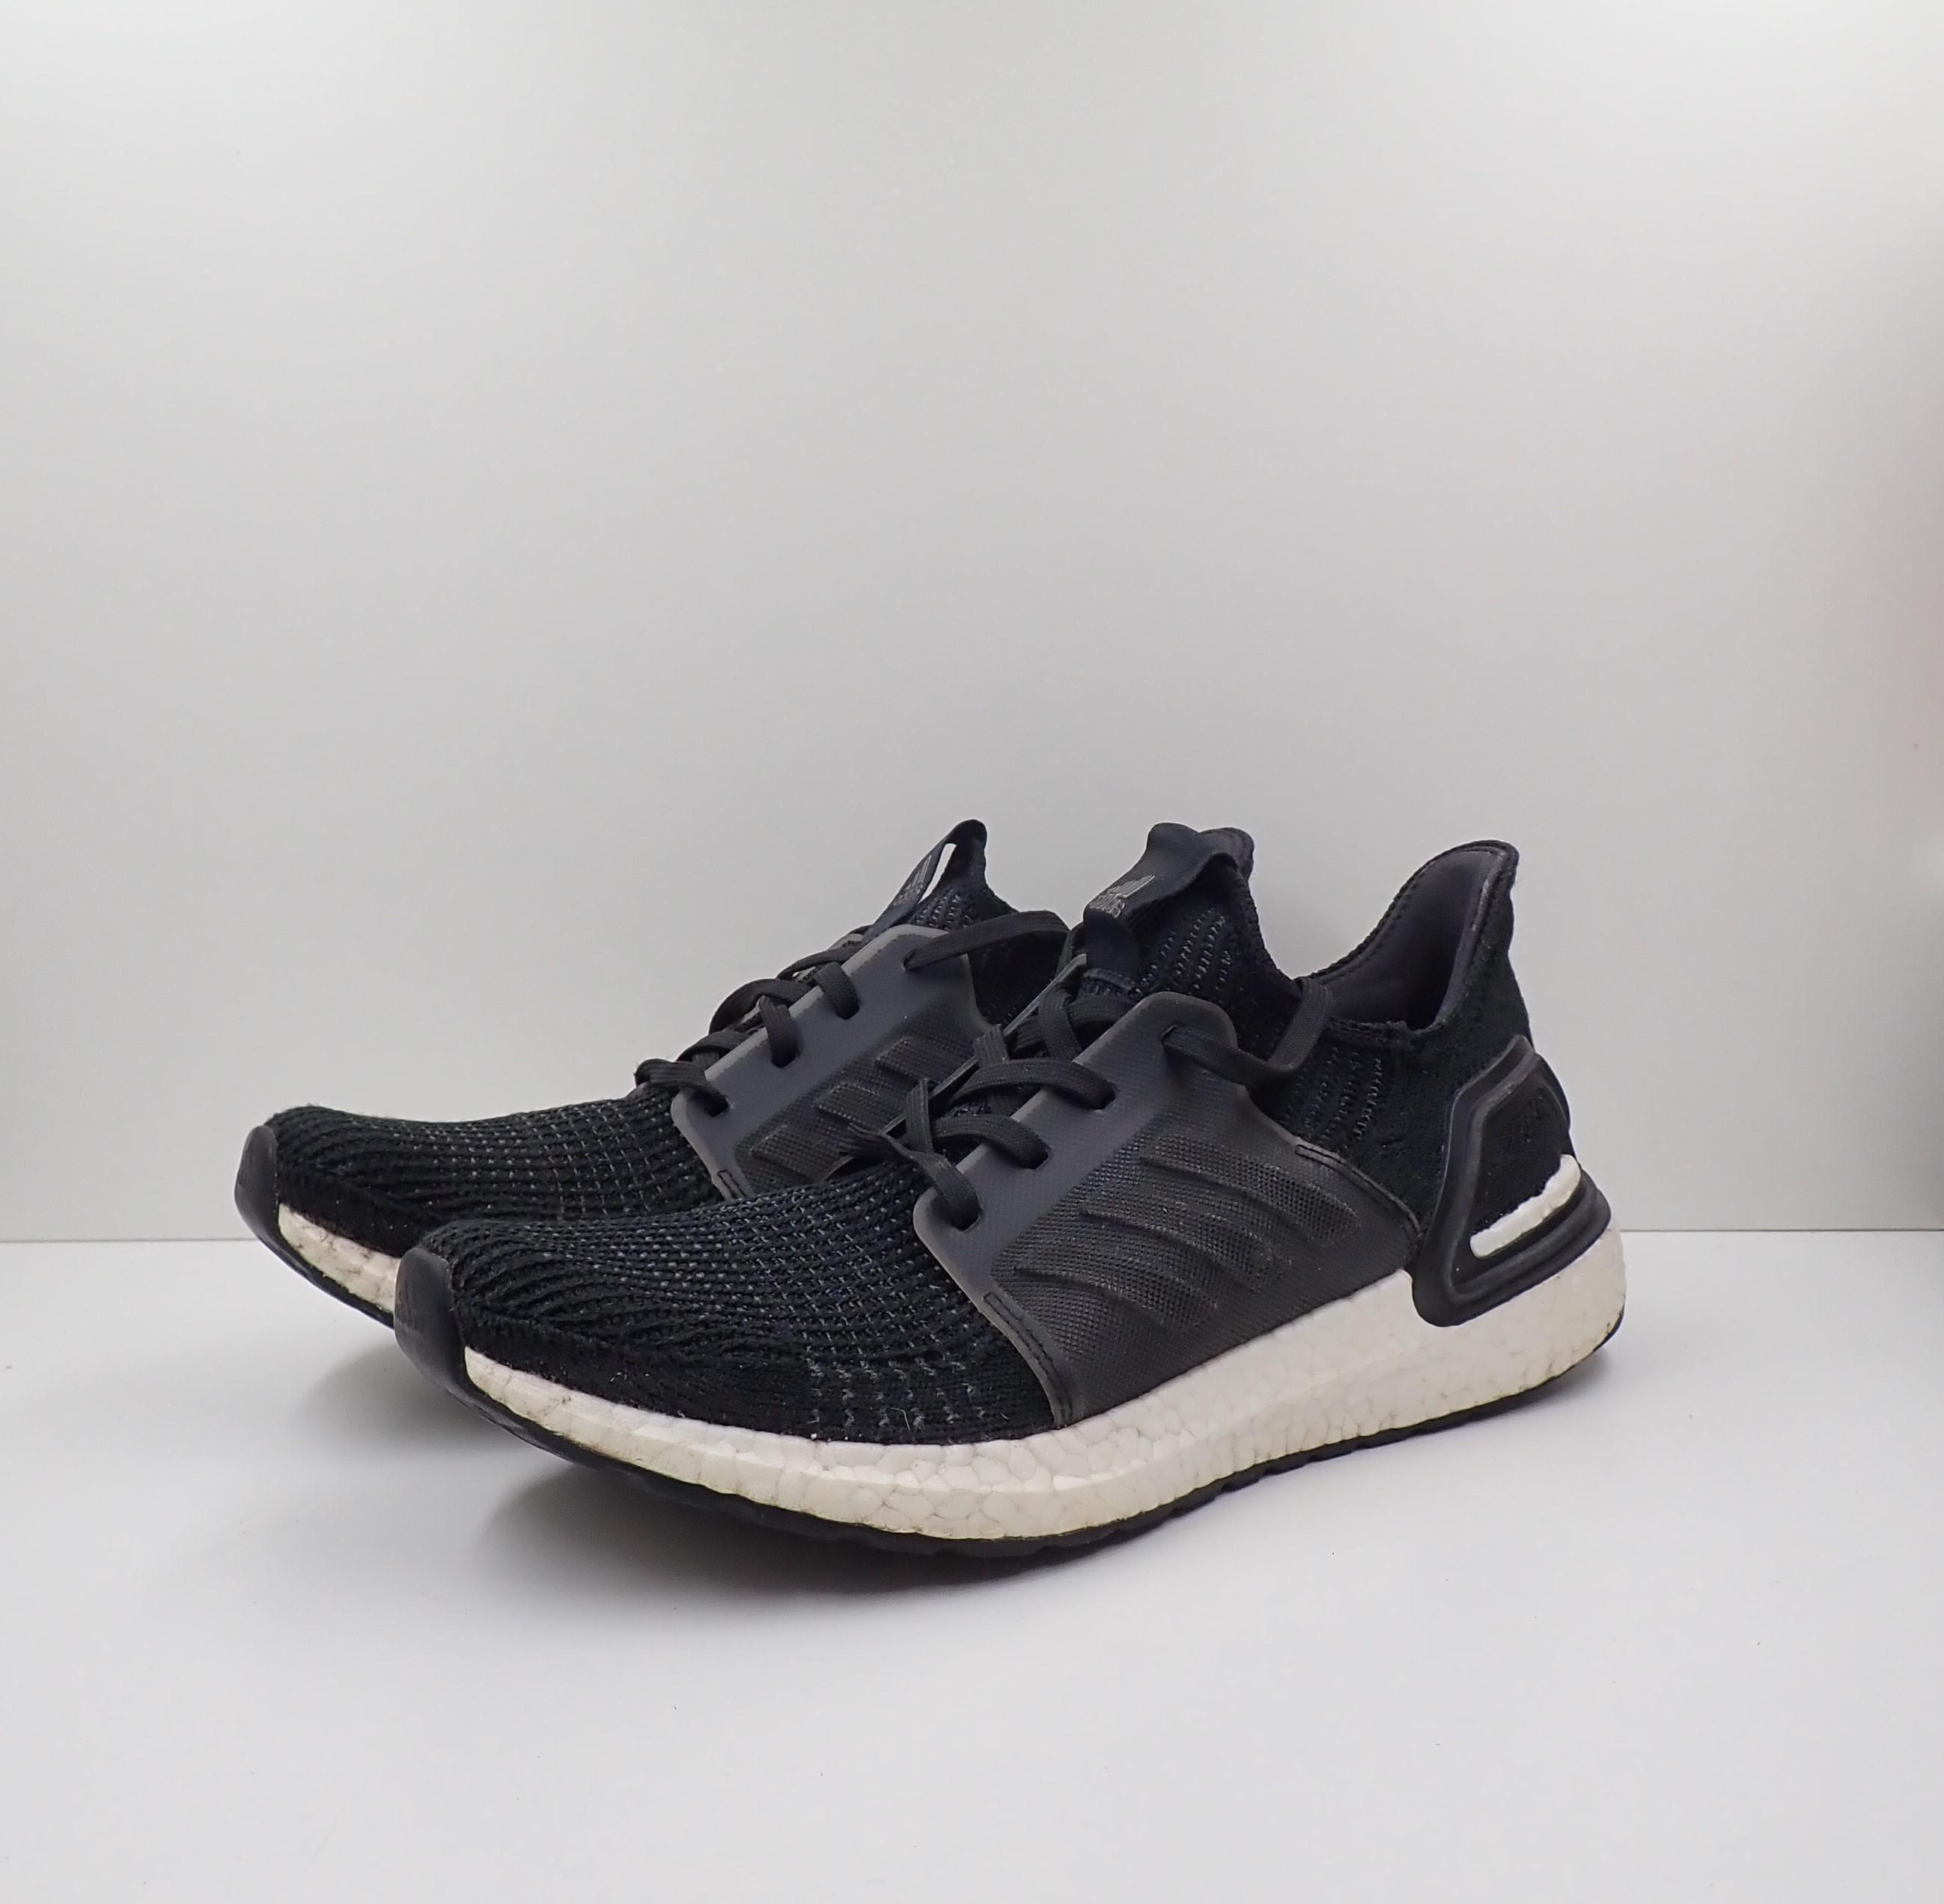 Adidas Performance Ultraboost 19 (W)